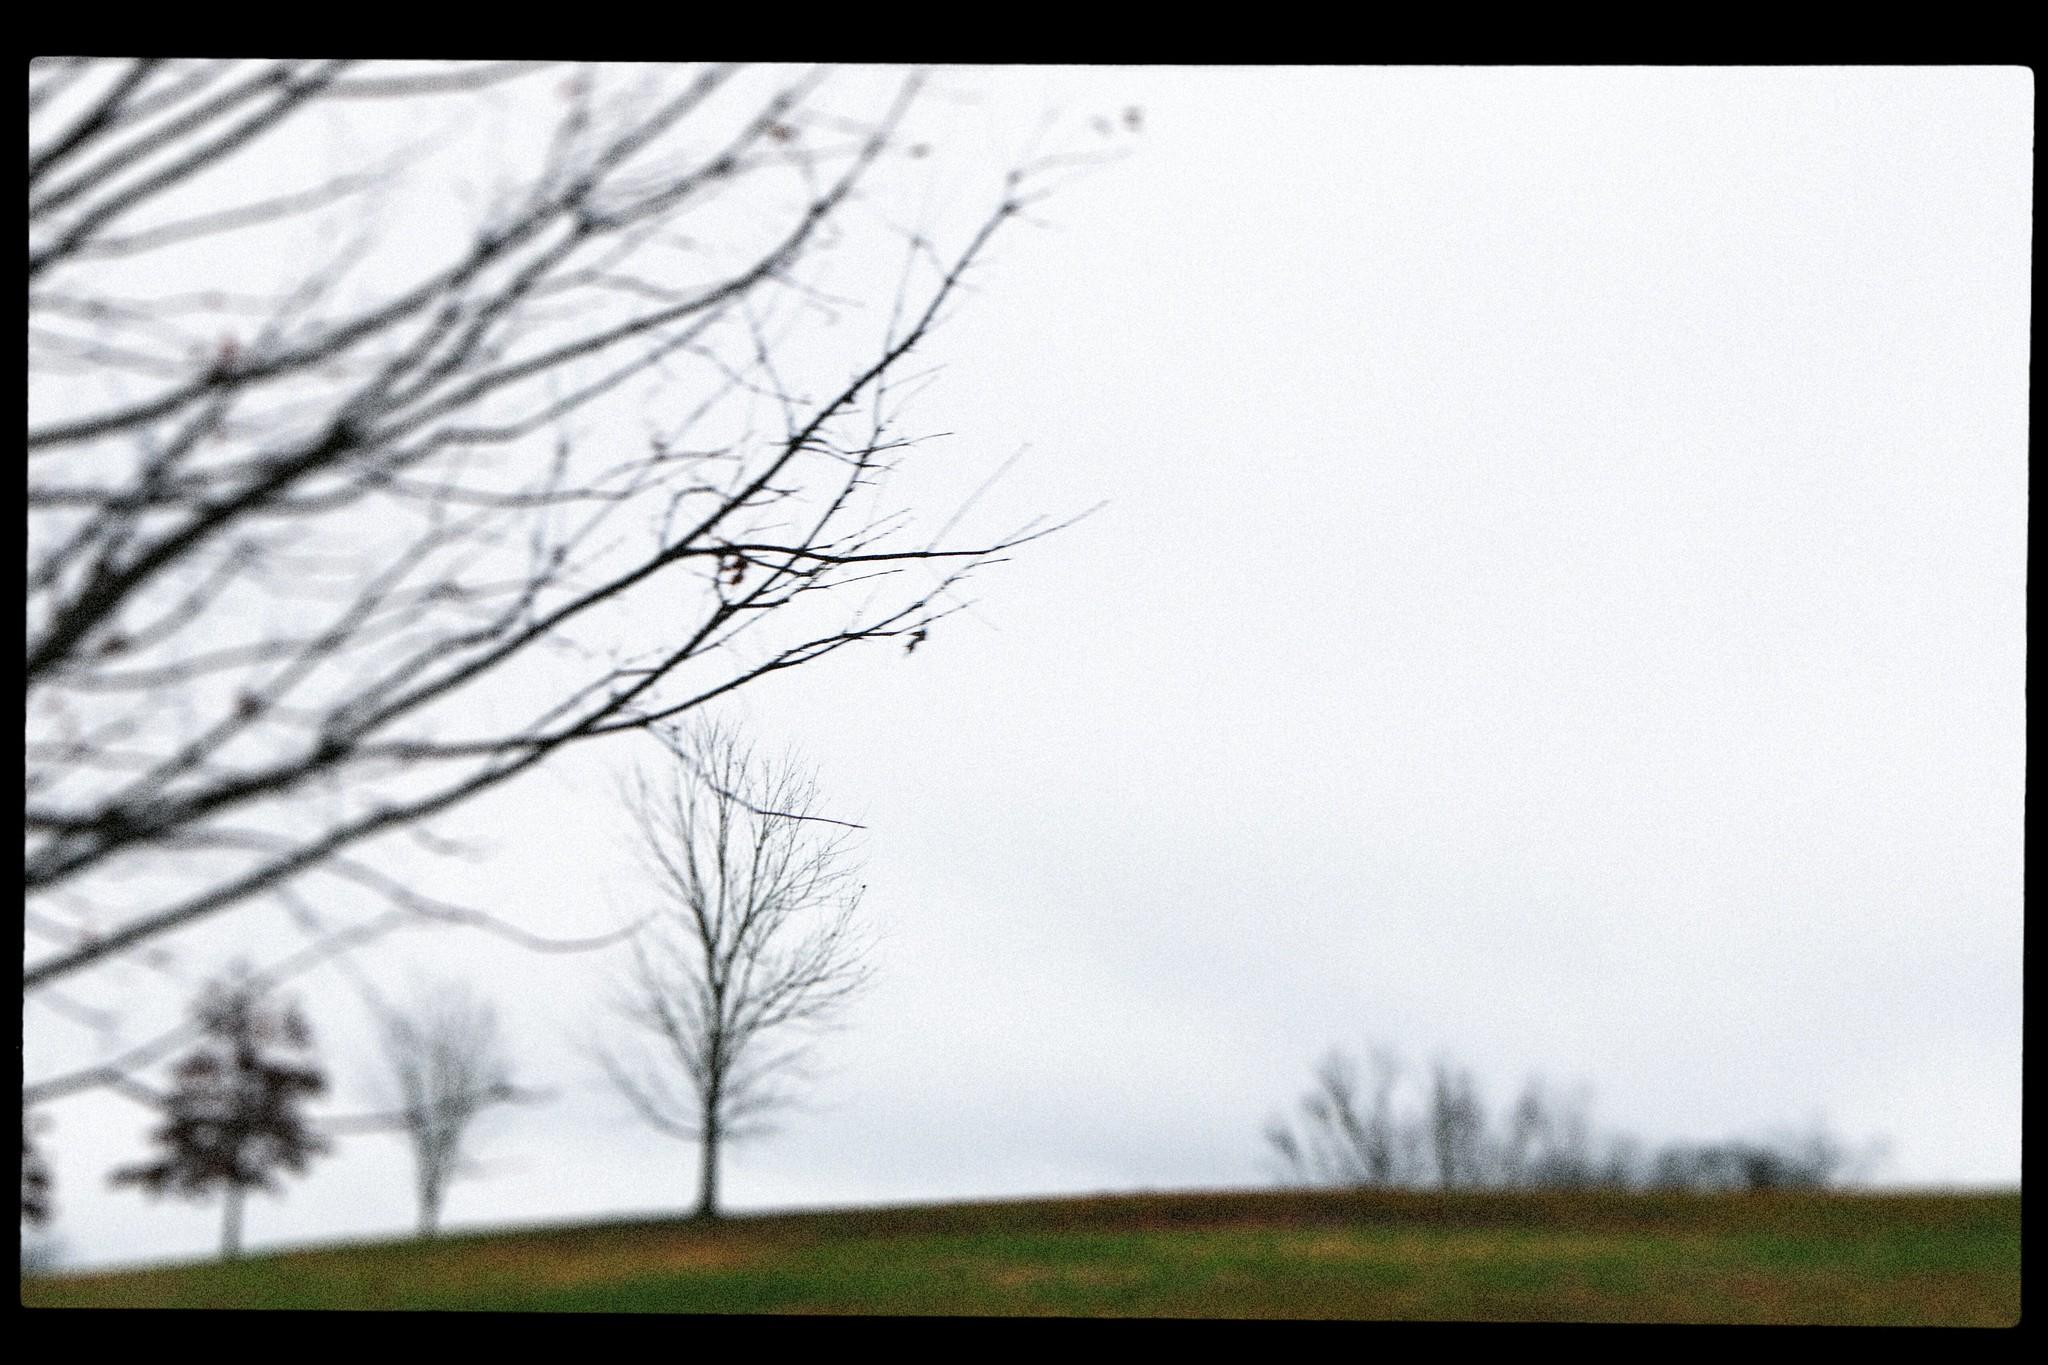 Freedom Park, Moreland Ave. December 2015